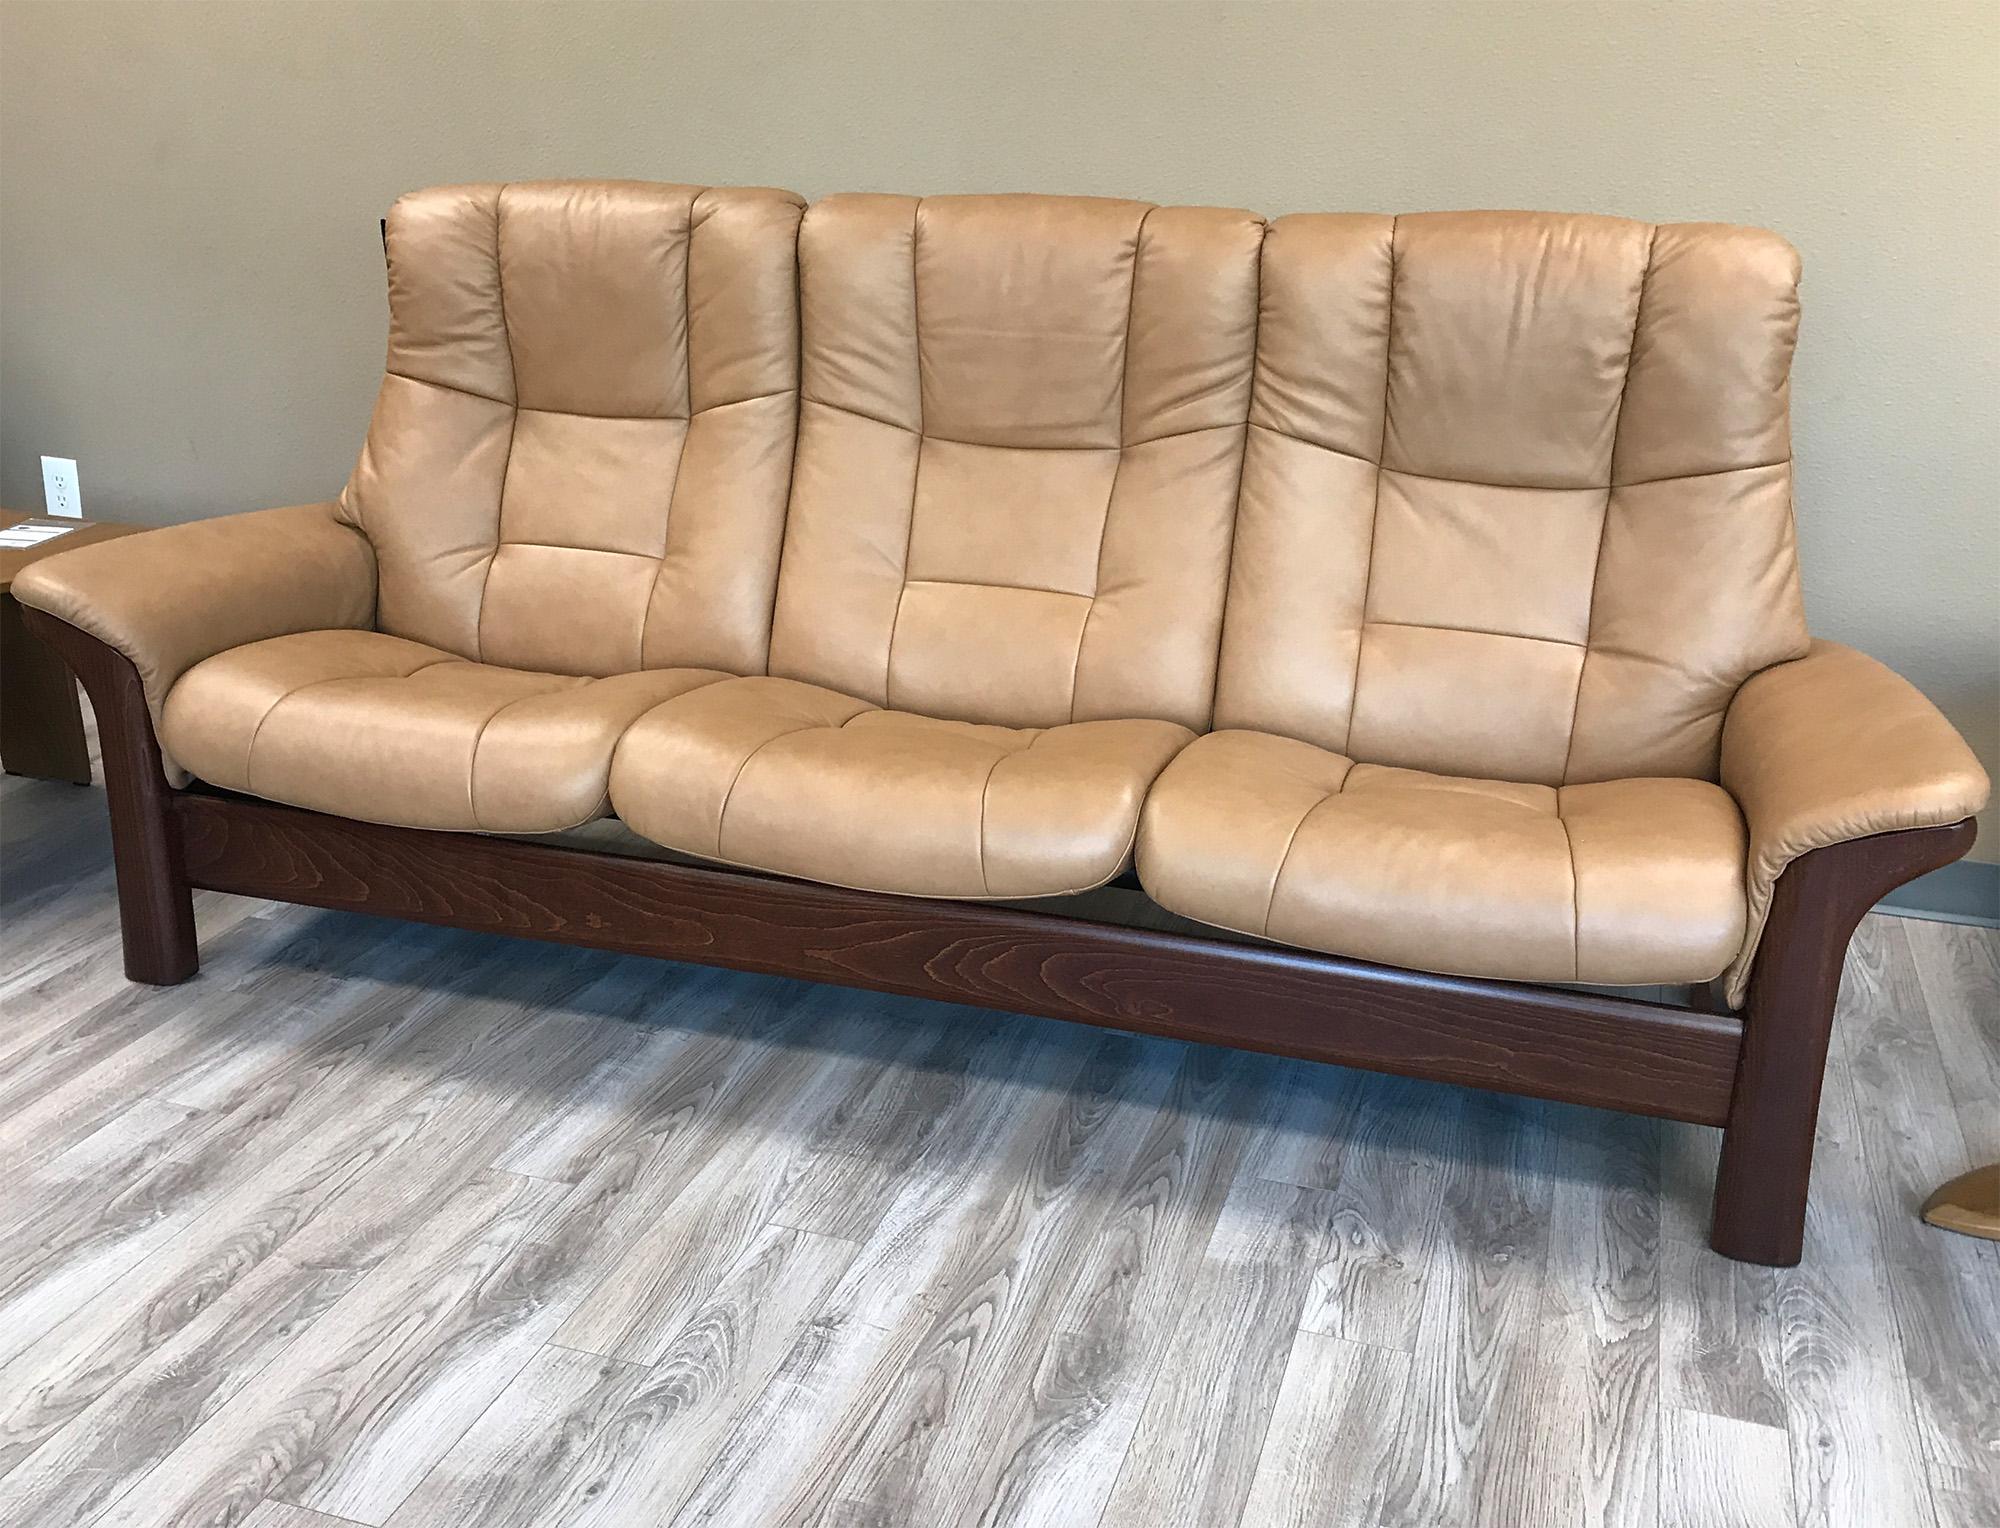 stressless buckingham 3 seat high back sofa paloma taupe color leather by ekornes. Black Bedroom Furniture Sets. Home Design Ideas